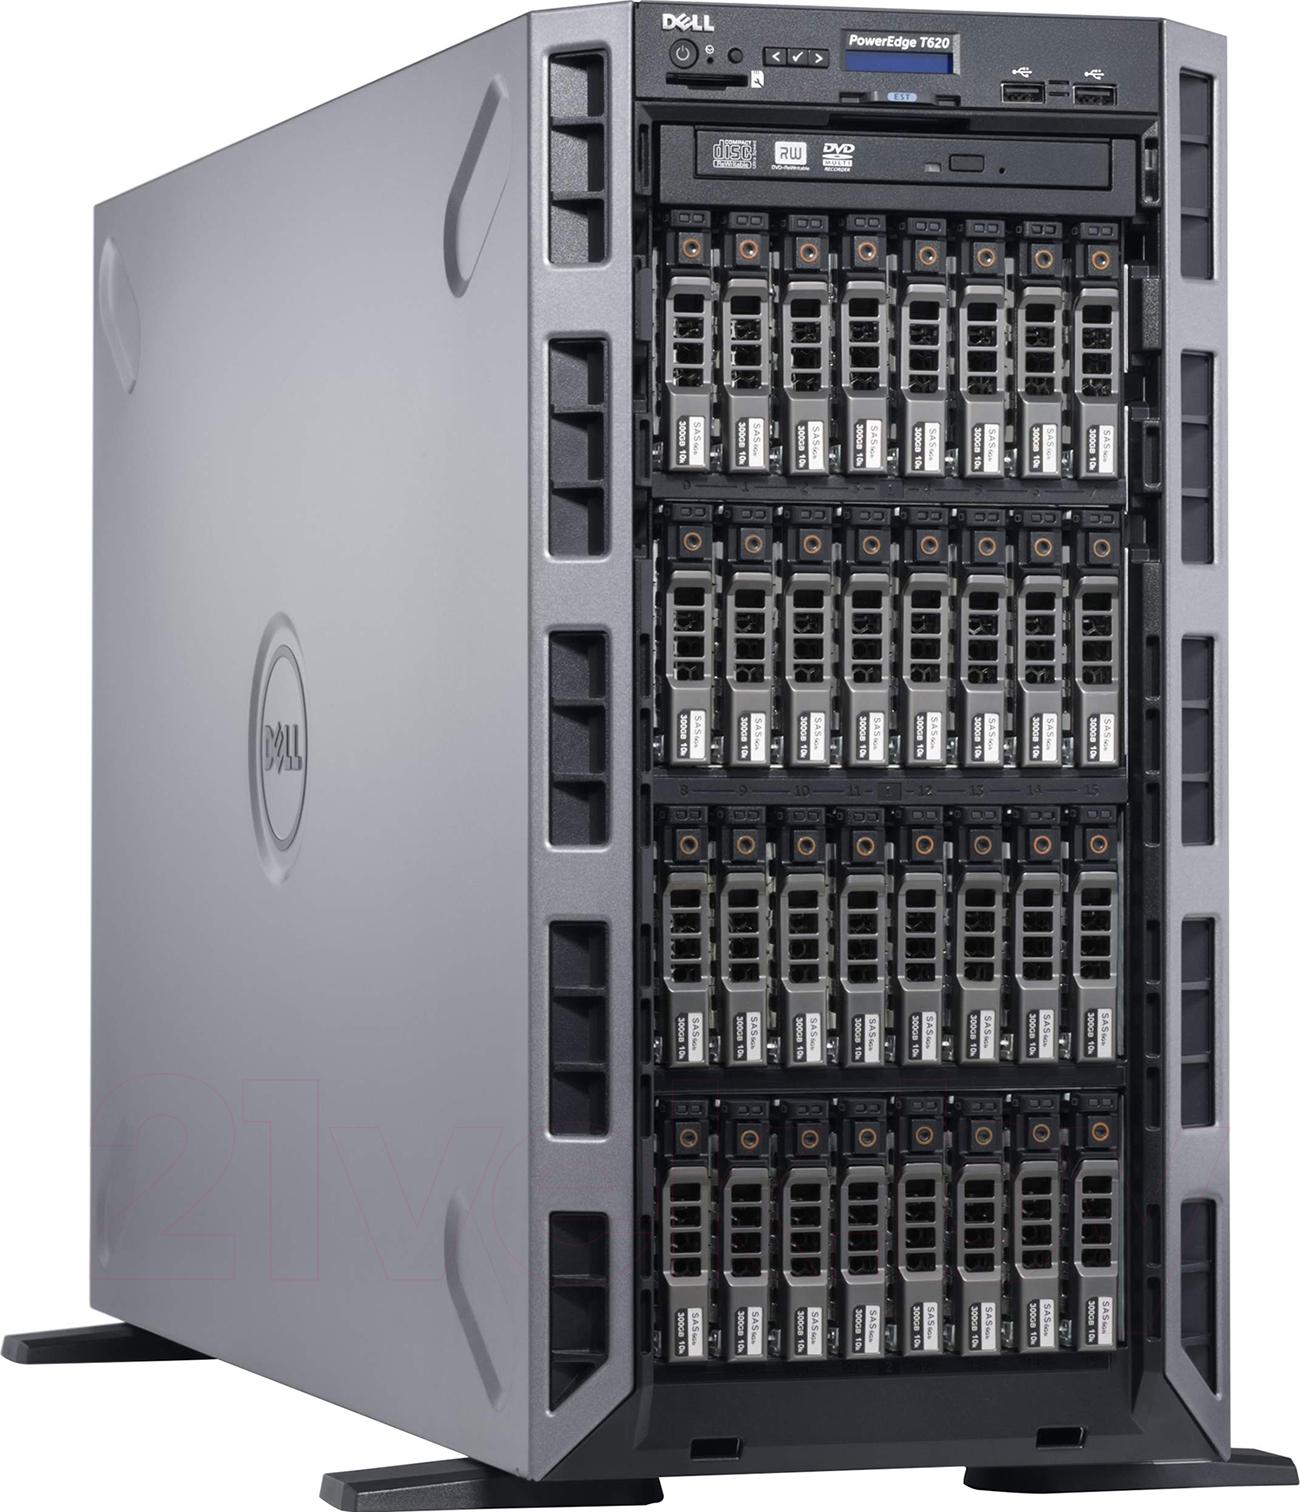 PowerEdge T620 210-ABMZ 21vek.by 34996000.000